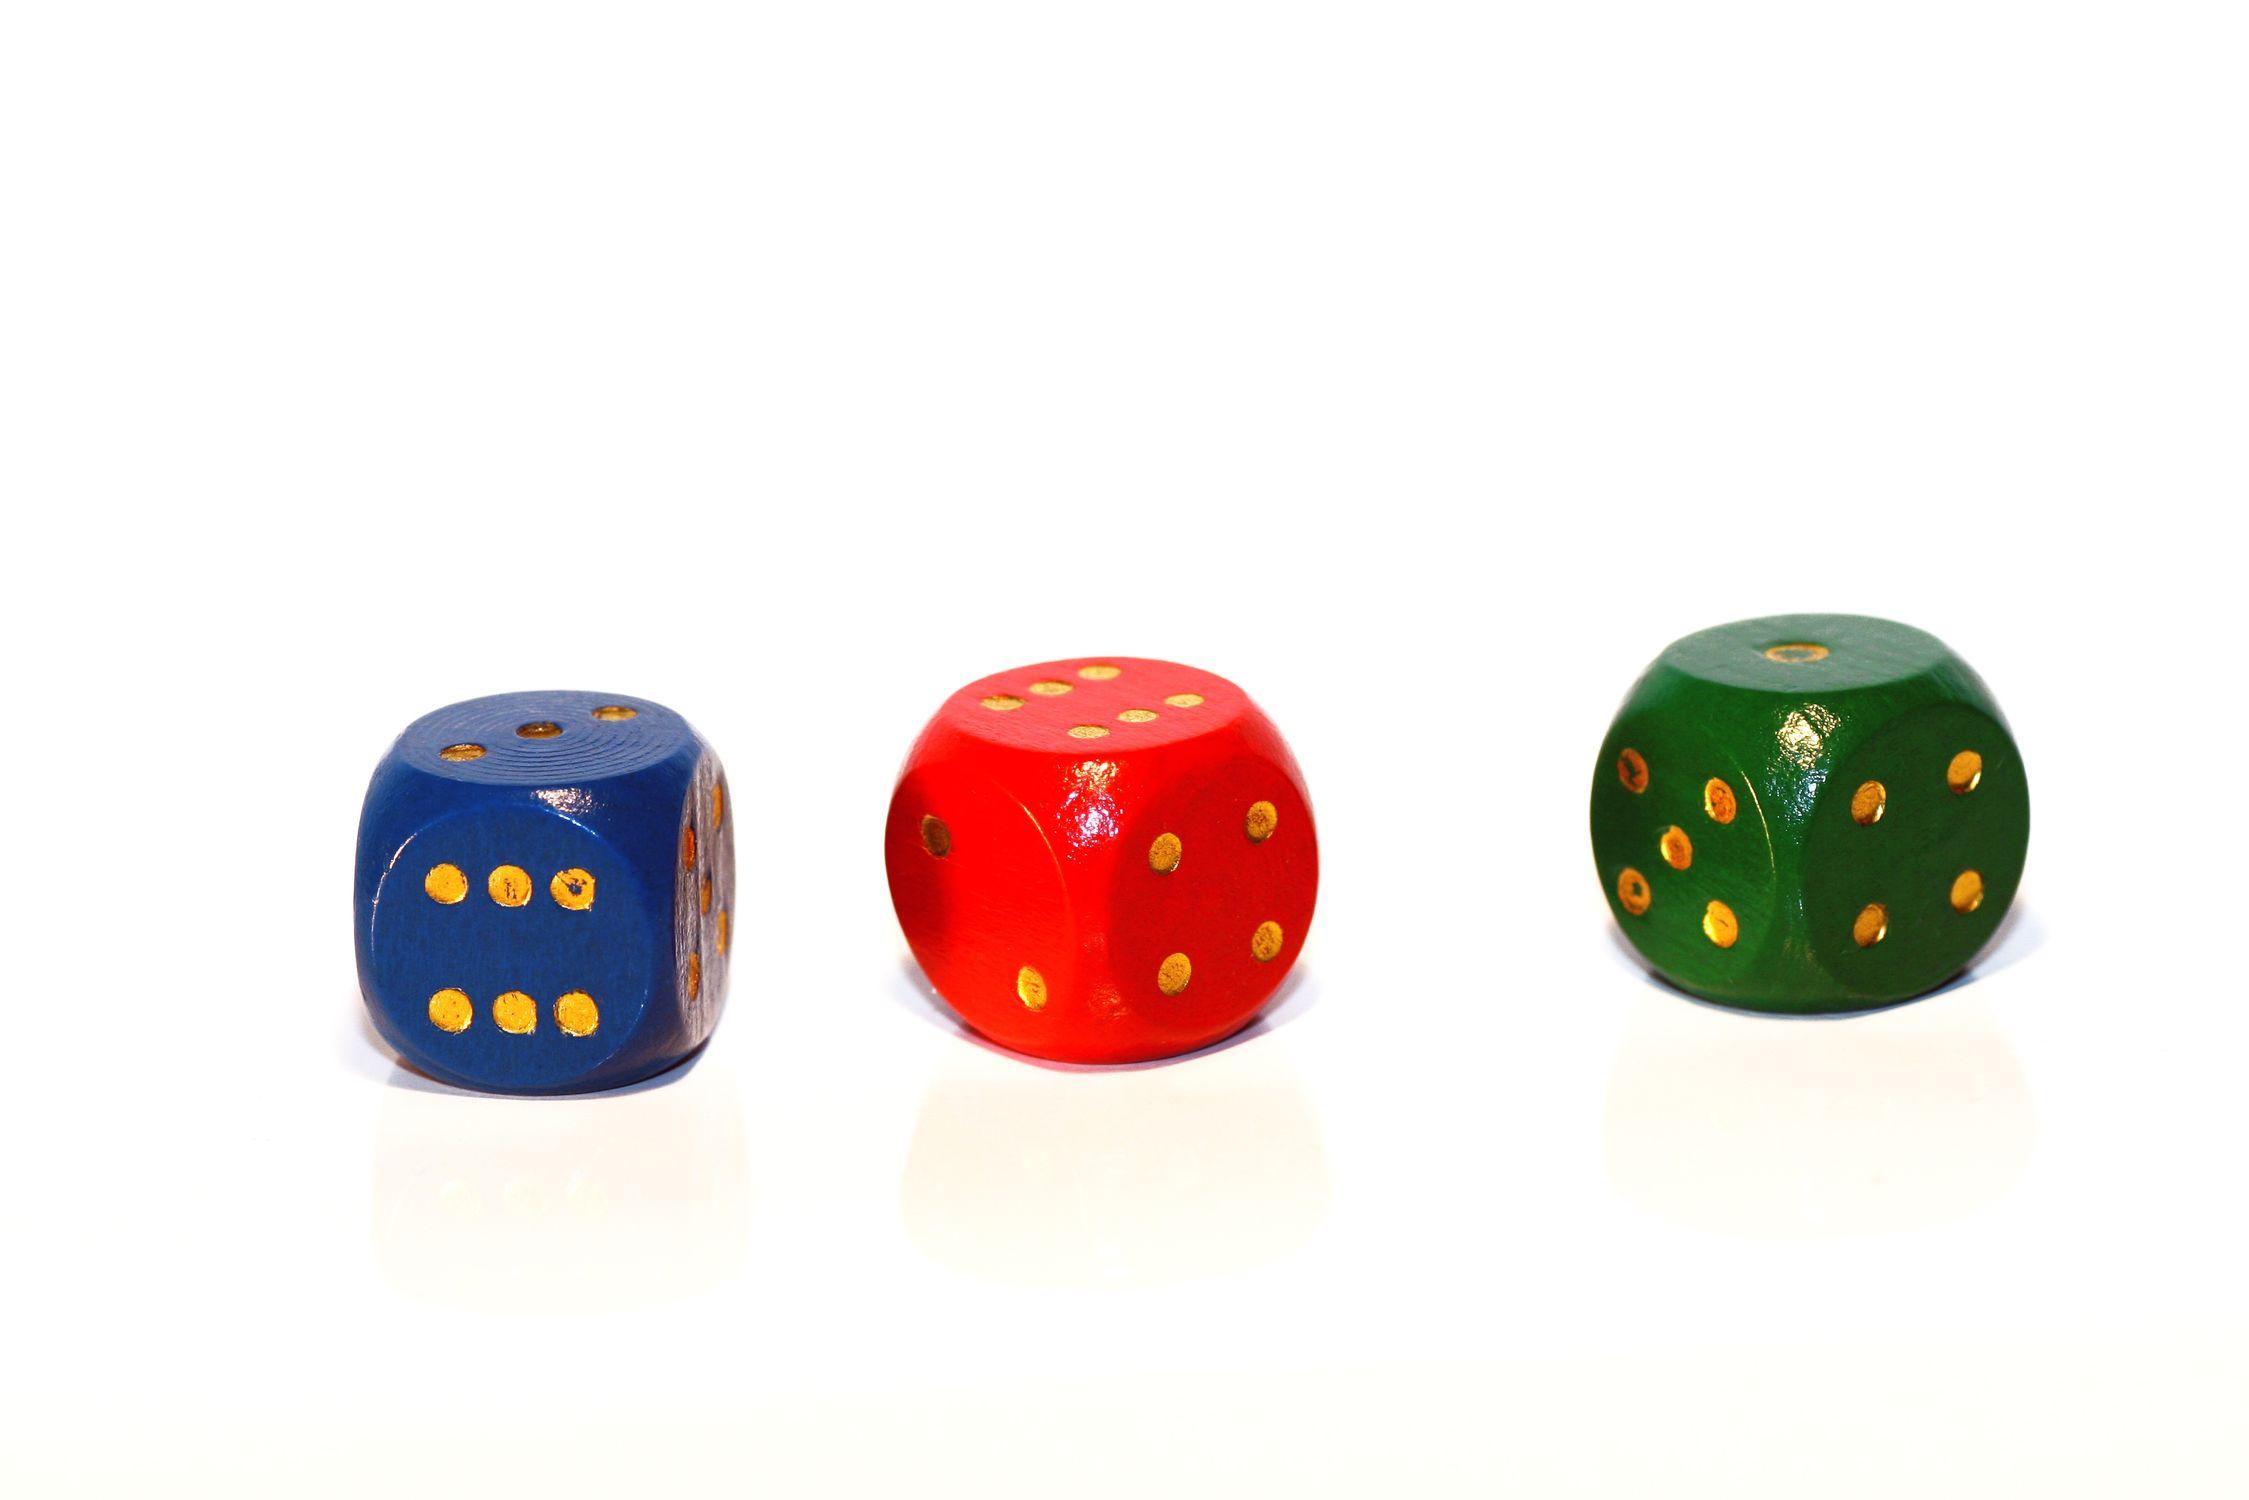 Bild mit Gegenstände, Grün, Weiß, Rot, Blau, Spiele und Spielzeuge, Würfel, Spielewürfel, Spielwürfel, Glückswürfel, Würfelspiel, 6er Würfel